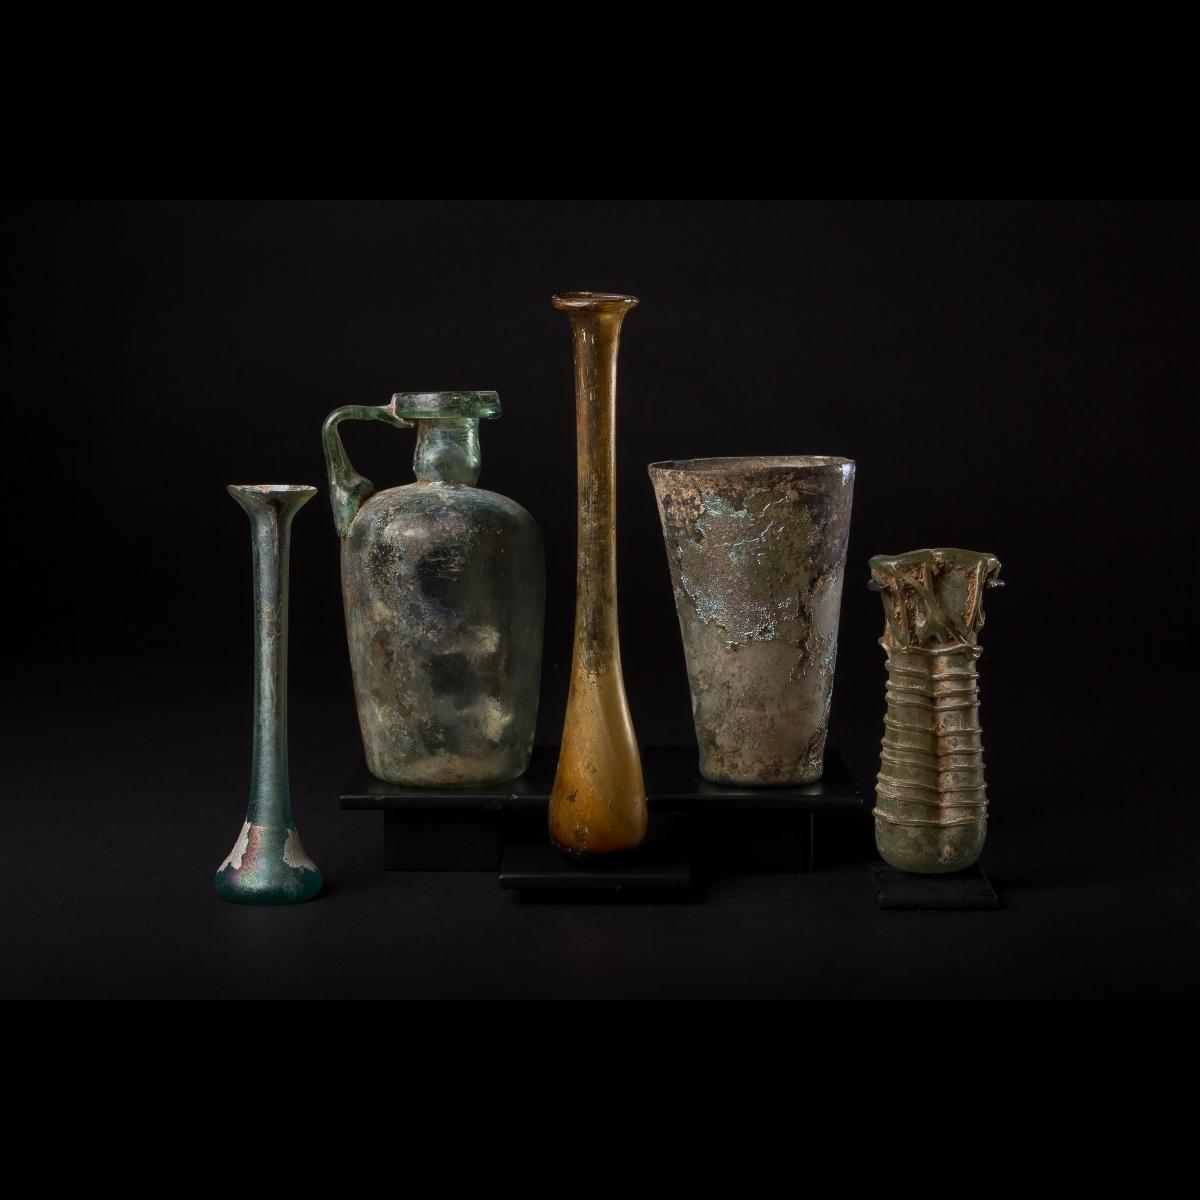 Photo of roman-glass-phenicia-mediterranean-area-galerie-golconda-musuem-quality-2